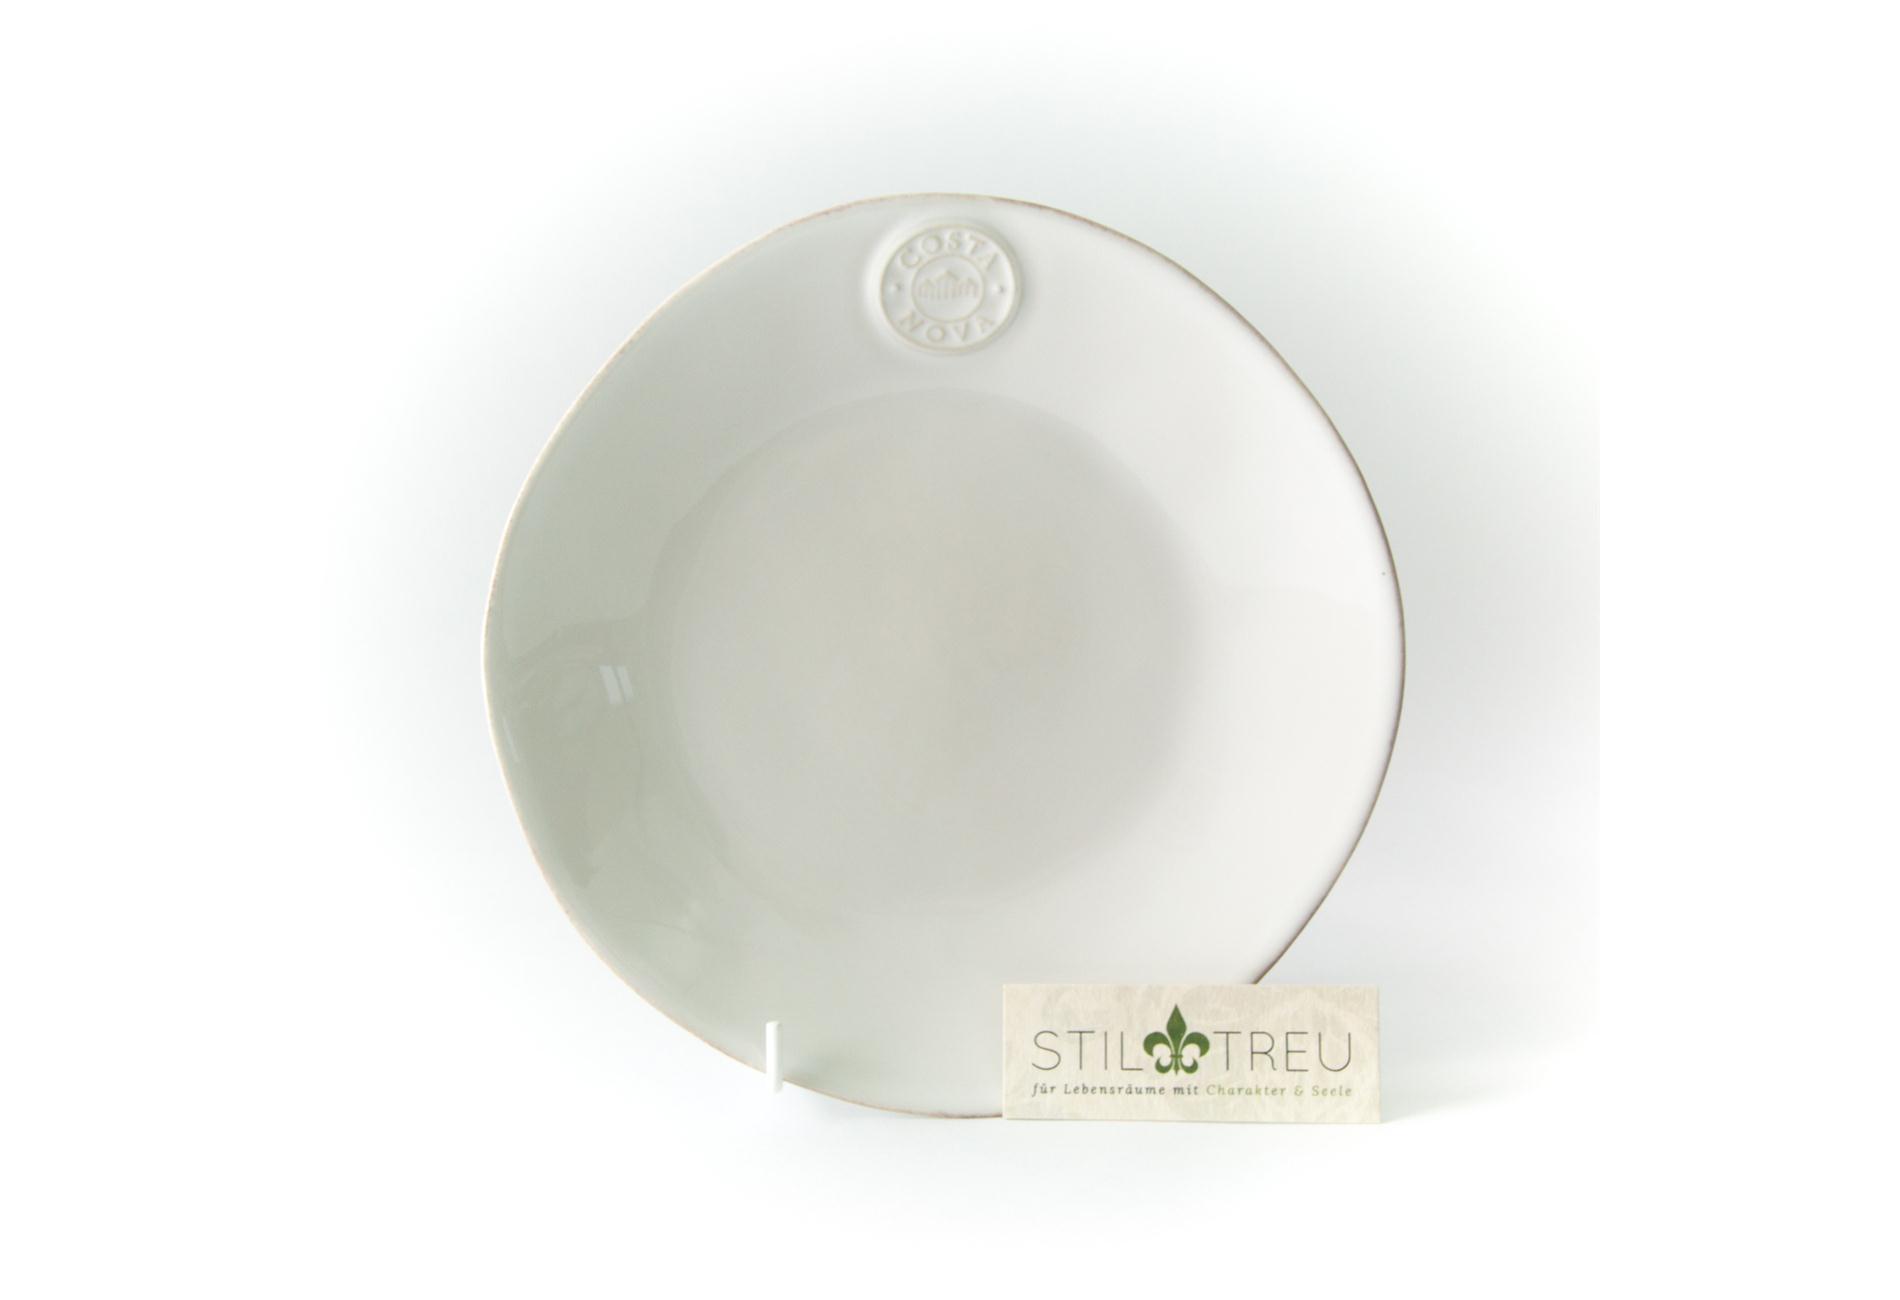 Costa Nova, Kuchenteller / Dessertteller / Salatteller, Nova, weiß, 21 cm